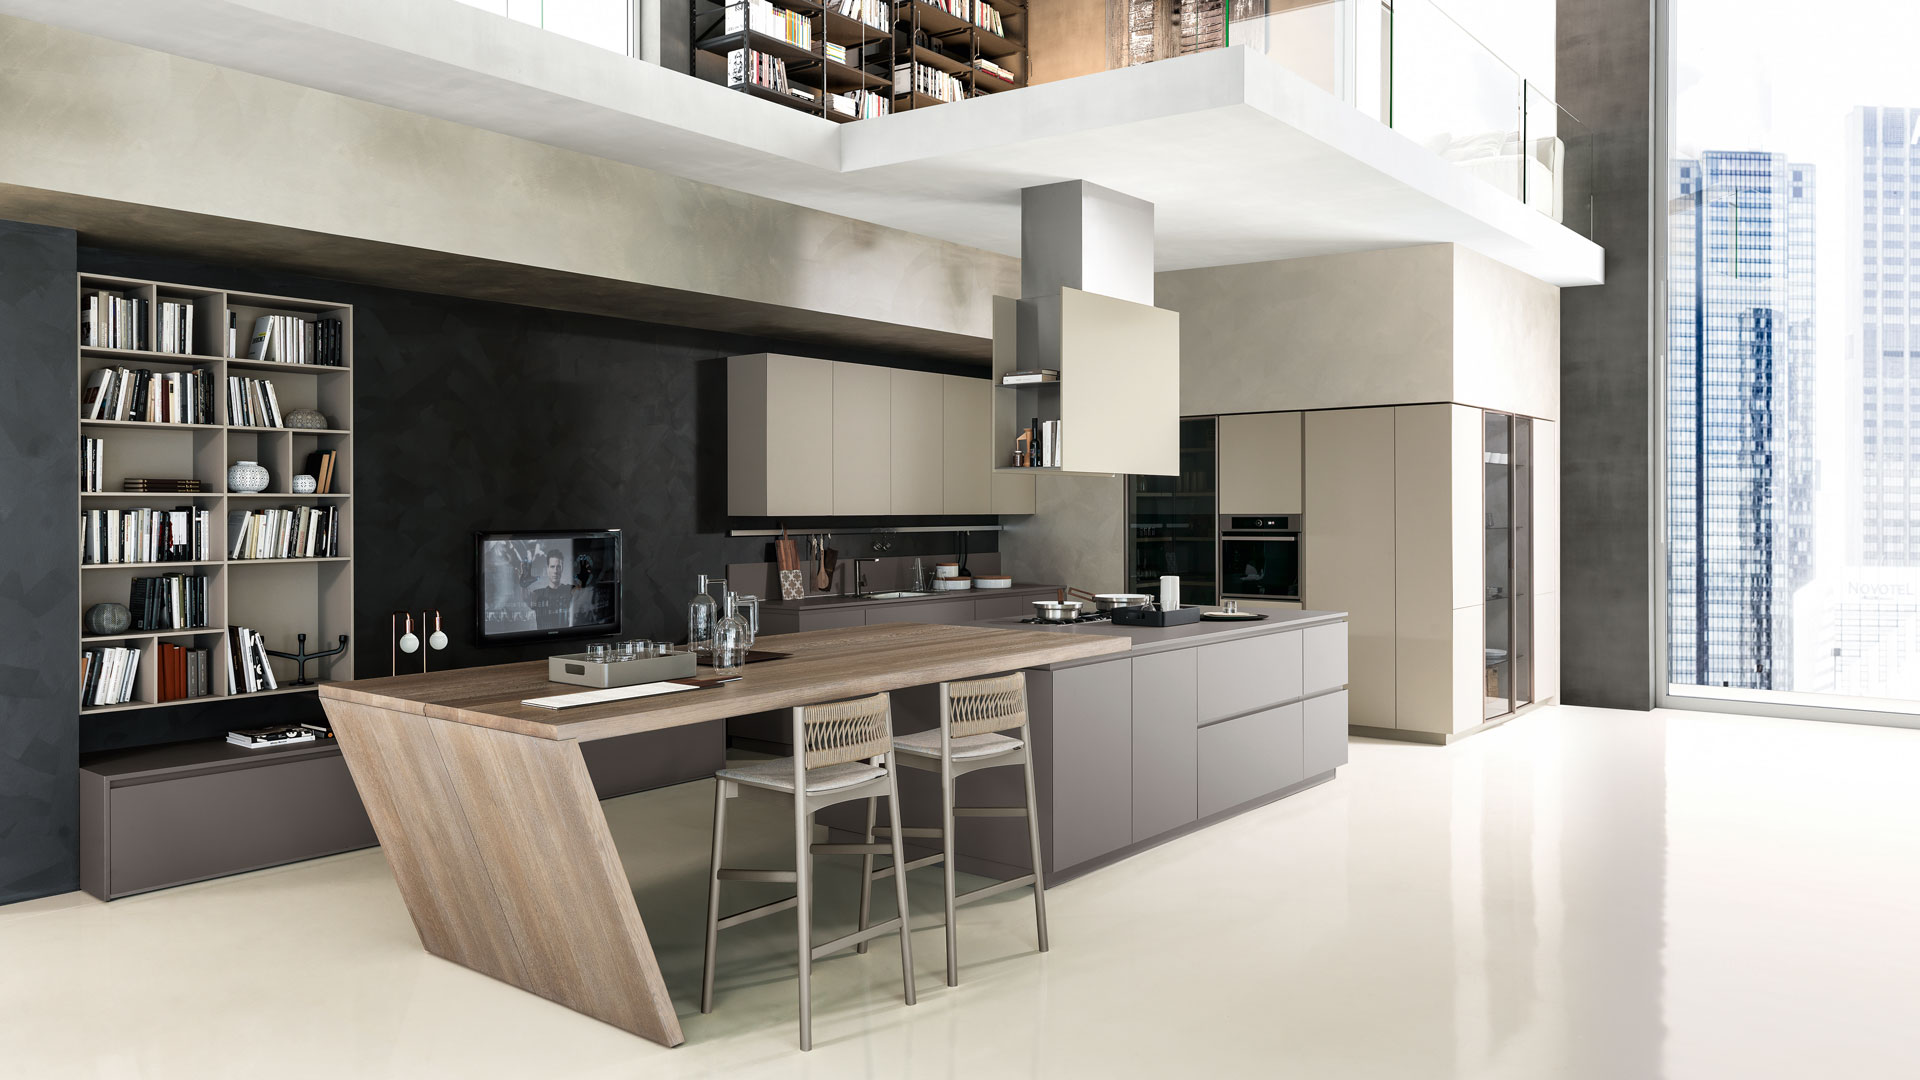 Cucine a palermo garden house - Cucine artigianali palermo ...